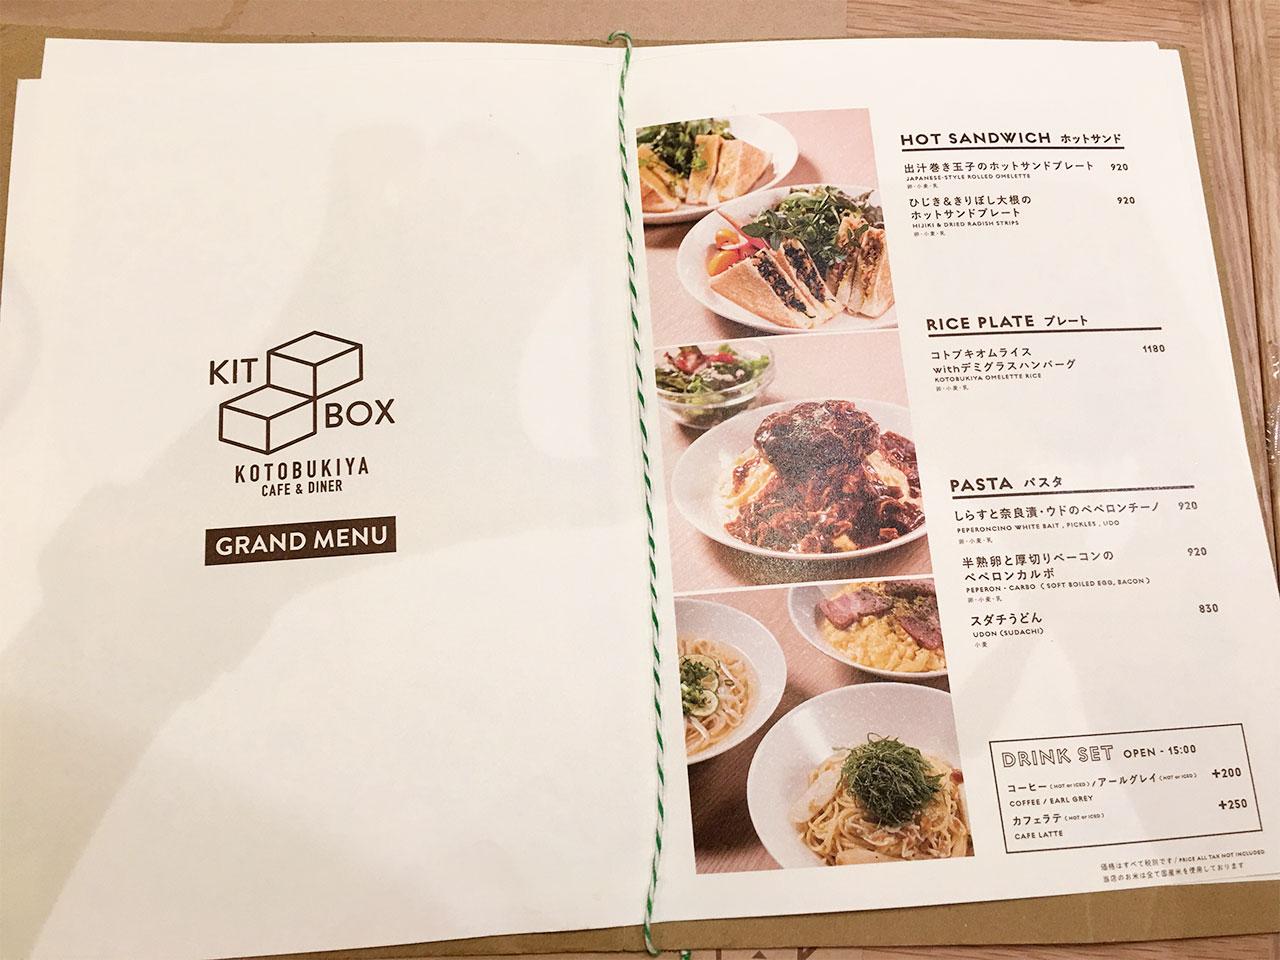 tachikawa-danboard-cafe-menu03